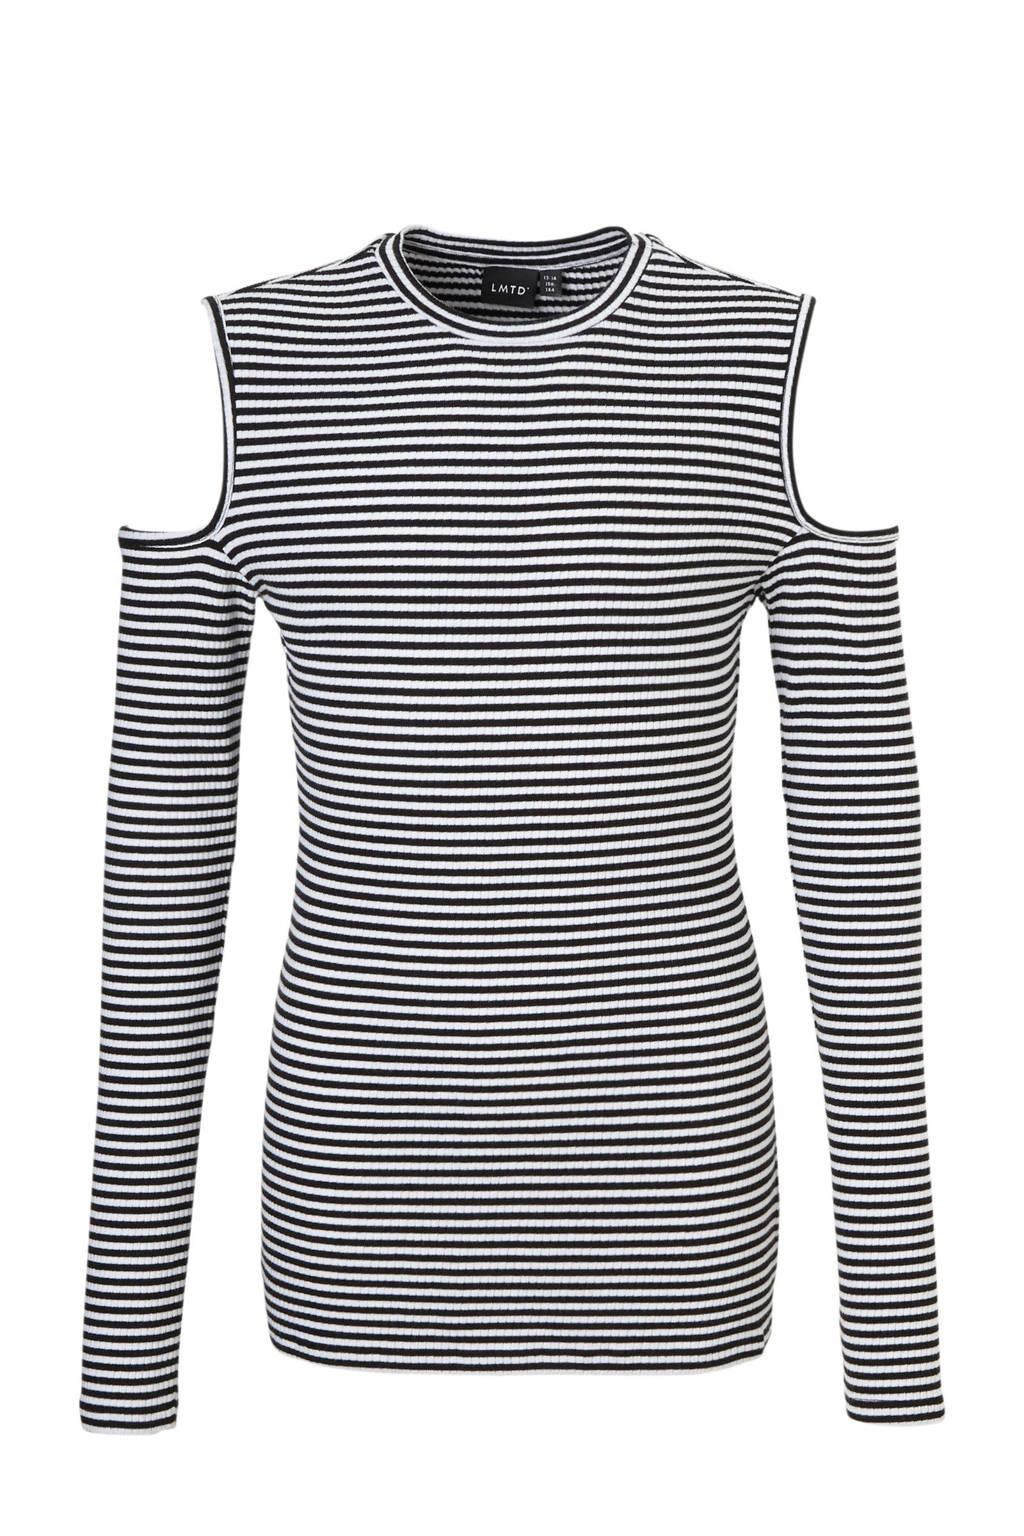 LMTD open shoulder top zwart/wit, Zwart/wit